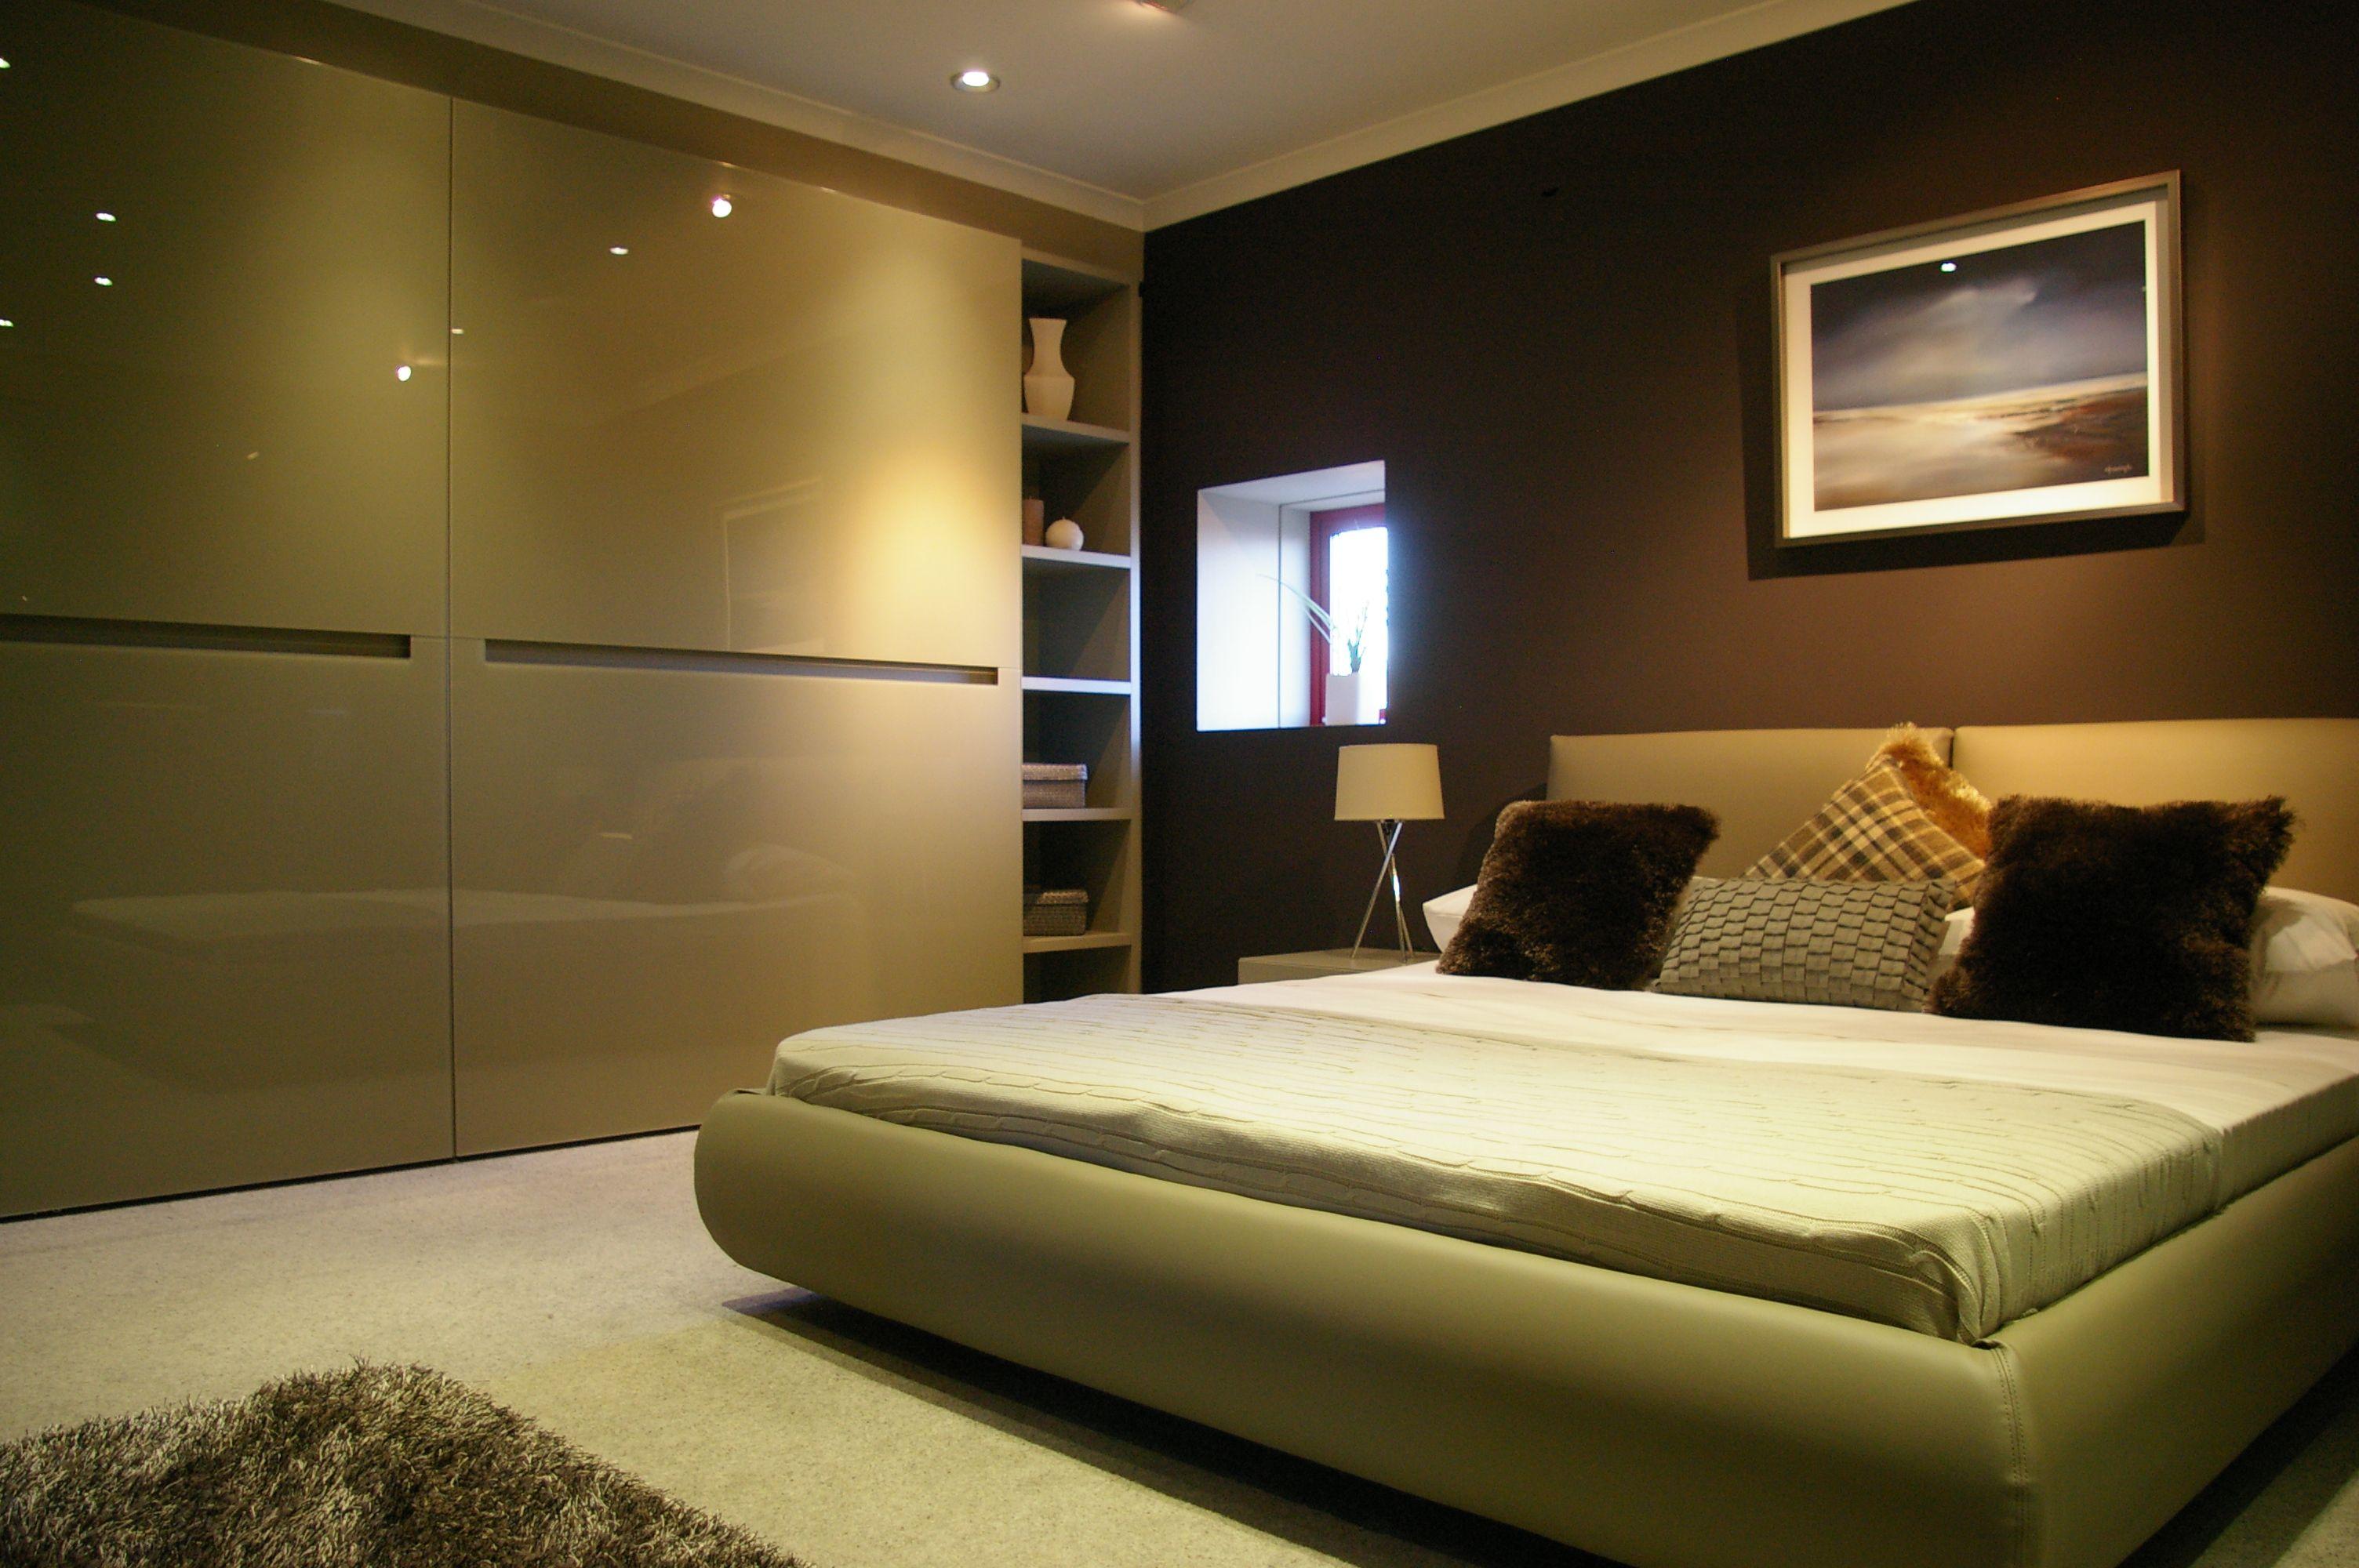 San Giacomo Bedroom Furniture · PerthBedroom FurnitureShowroom